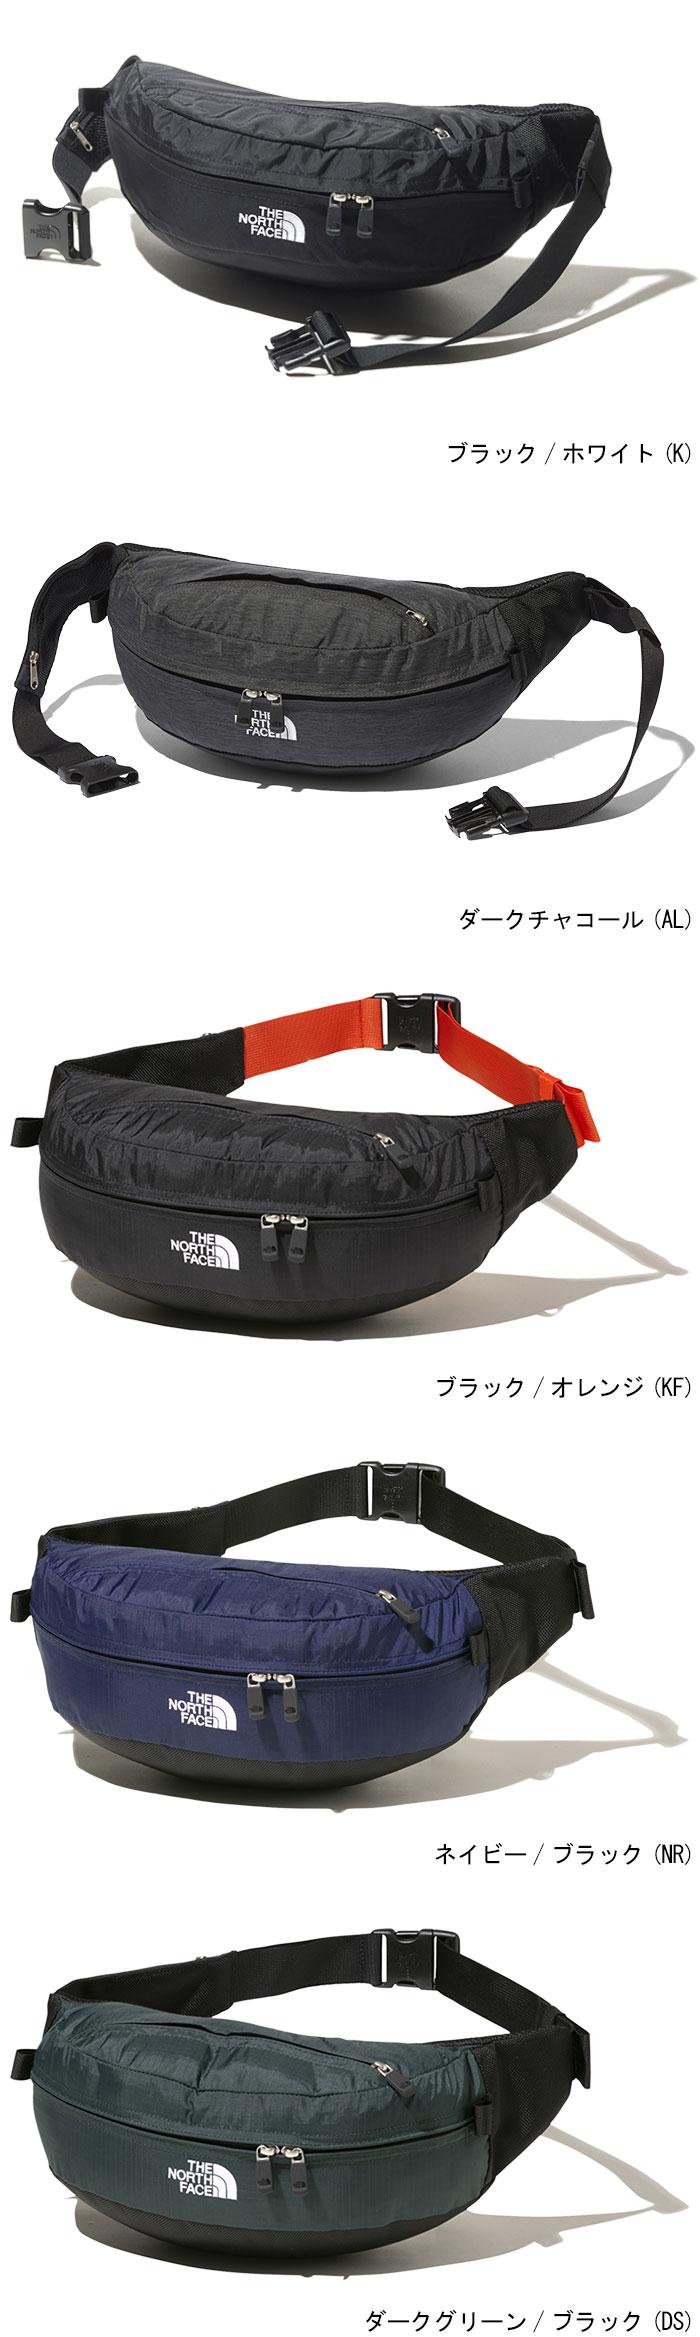 THE NORTH FACEザ ノースフェイスのバッグ Sweep Waist Bag04